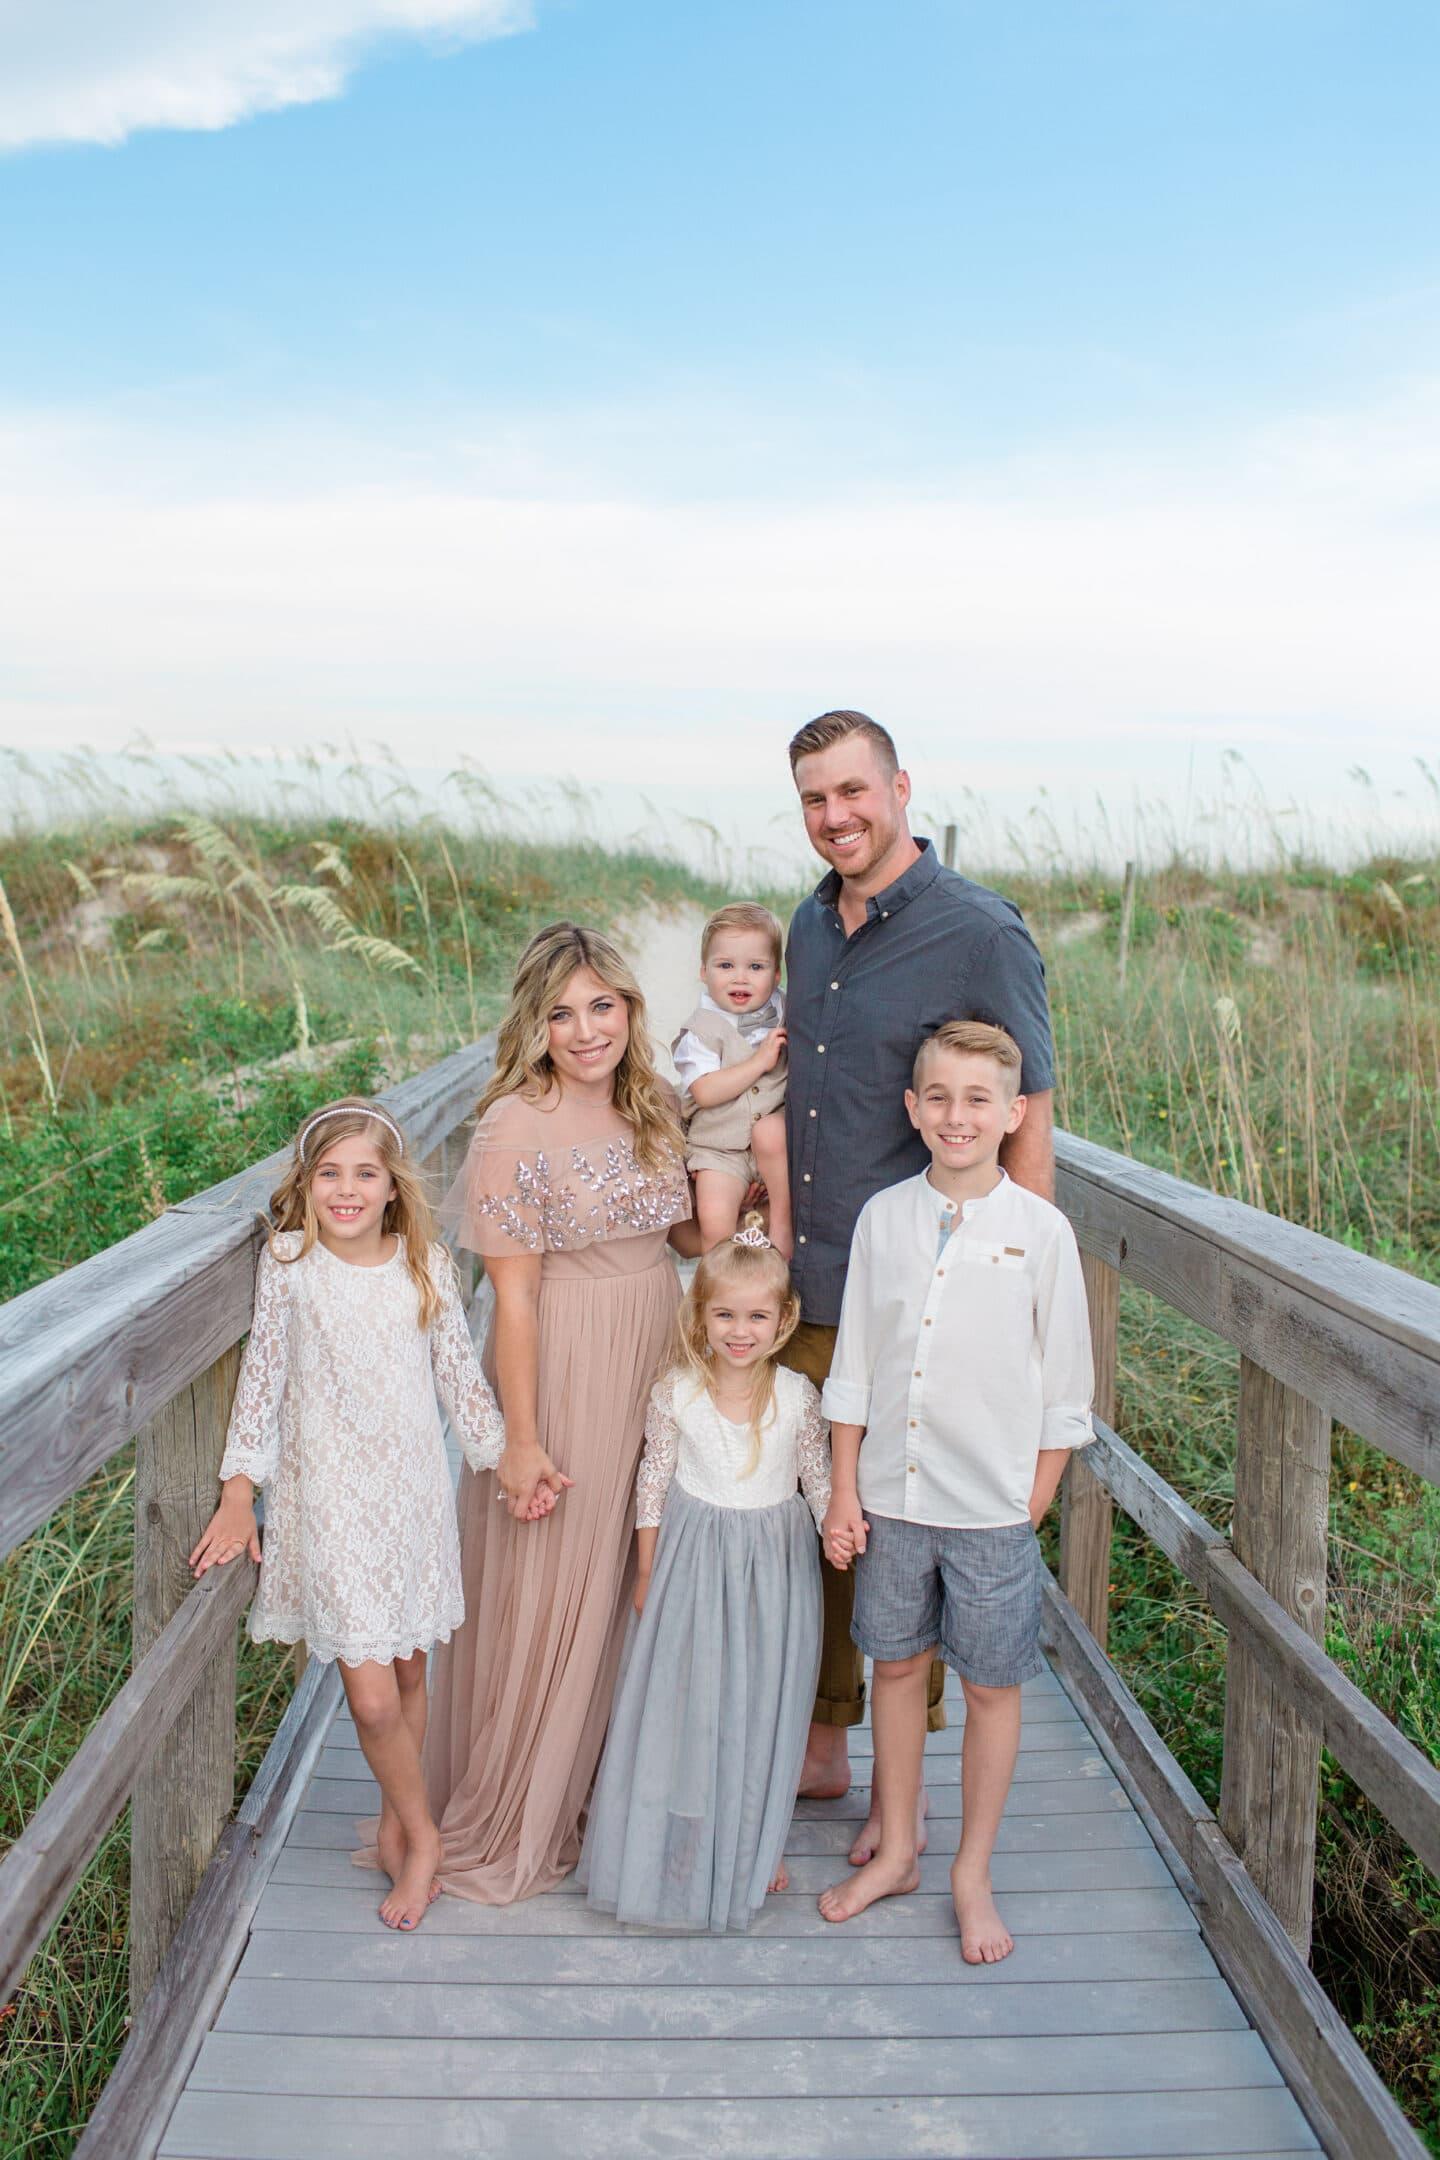 Family Photos July 2019 – St Augustine Beach